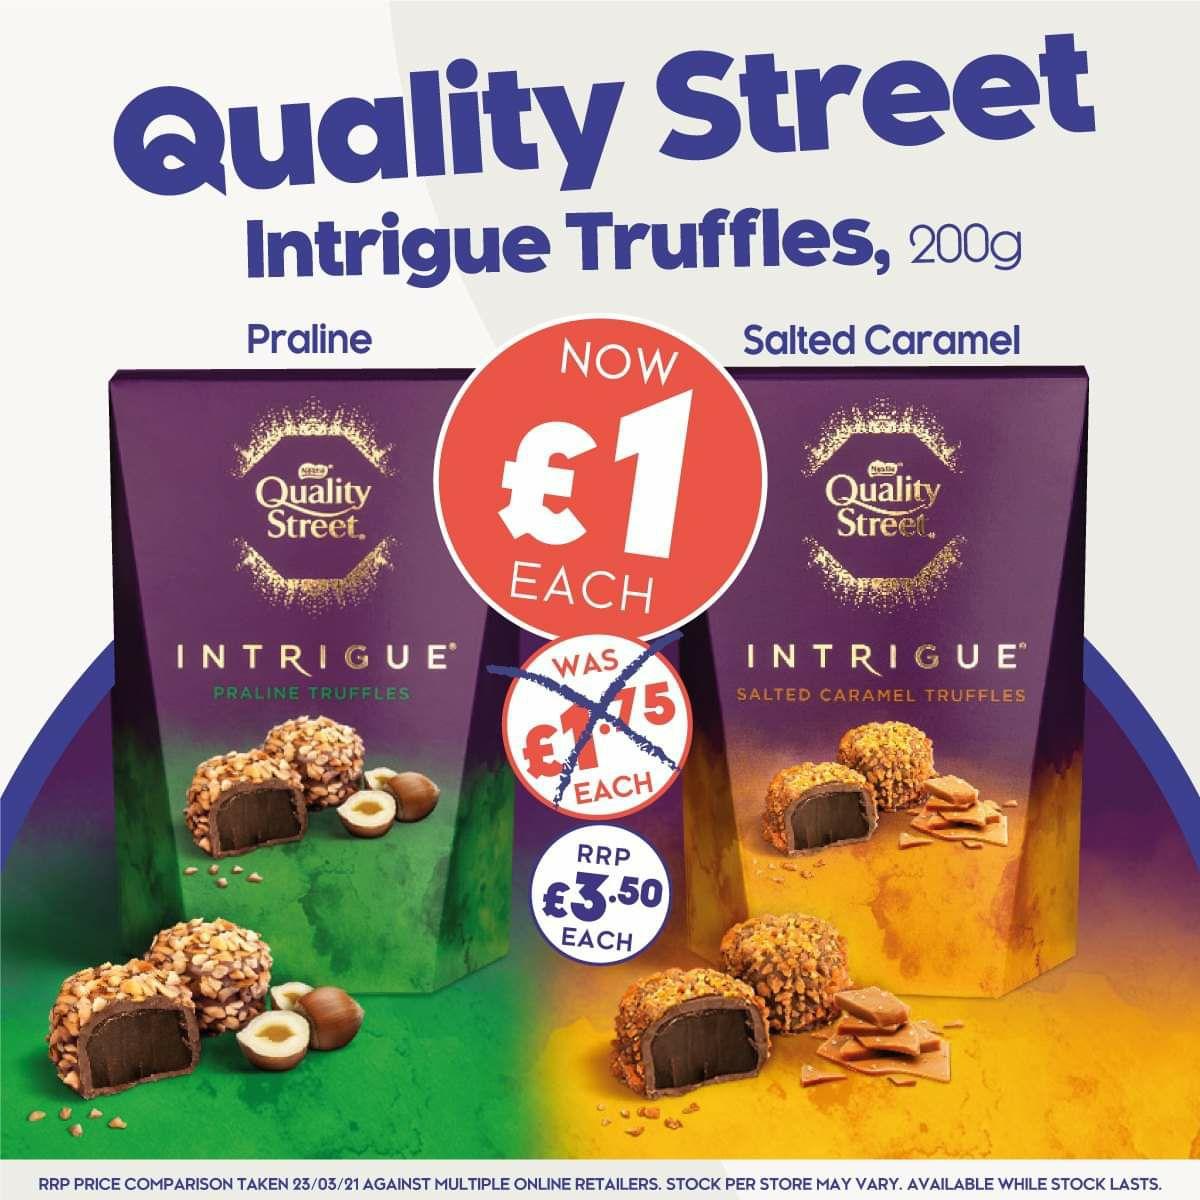 Quality Street Intrigue Truffles, 200g - £1 @ The Company Shop